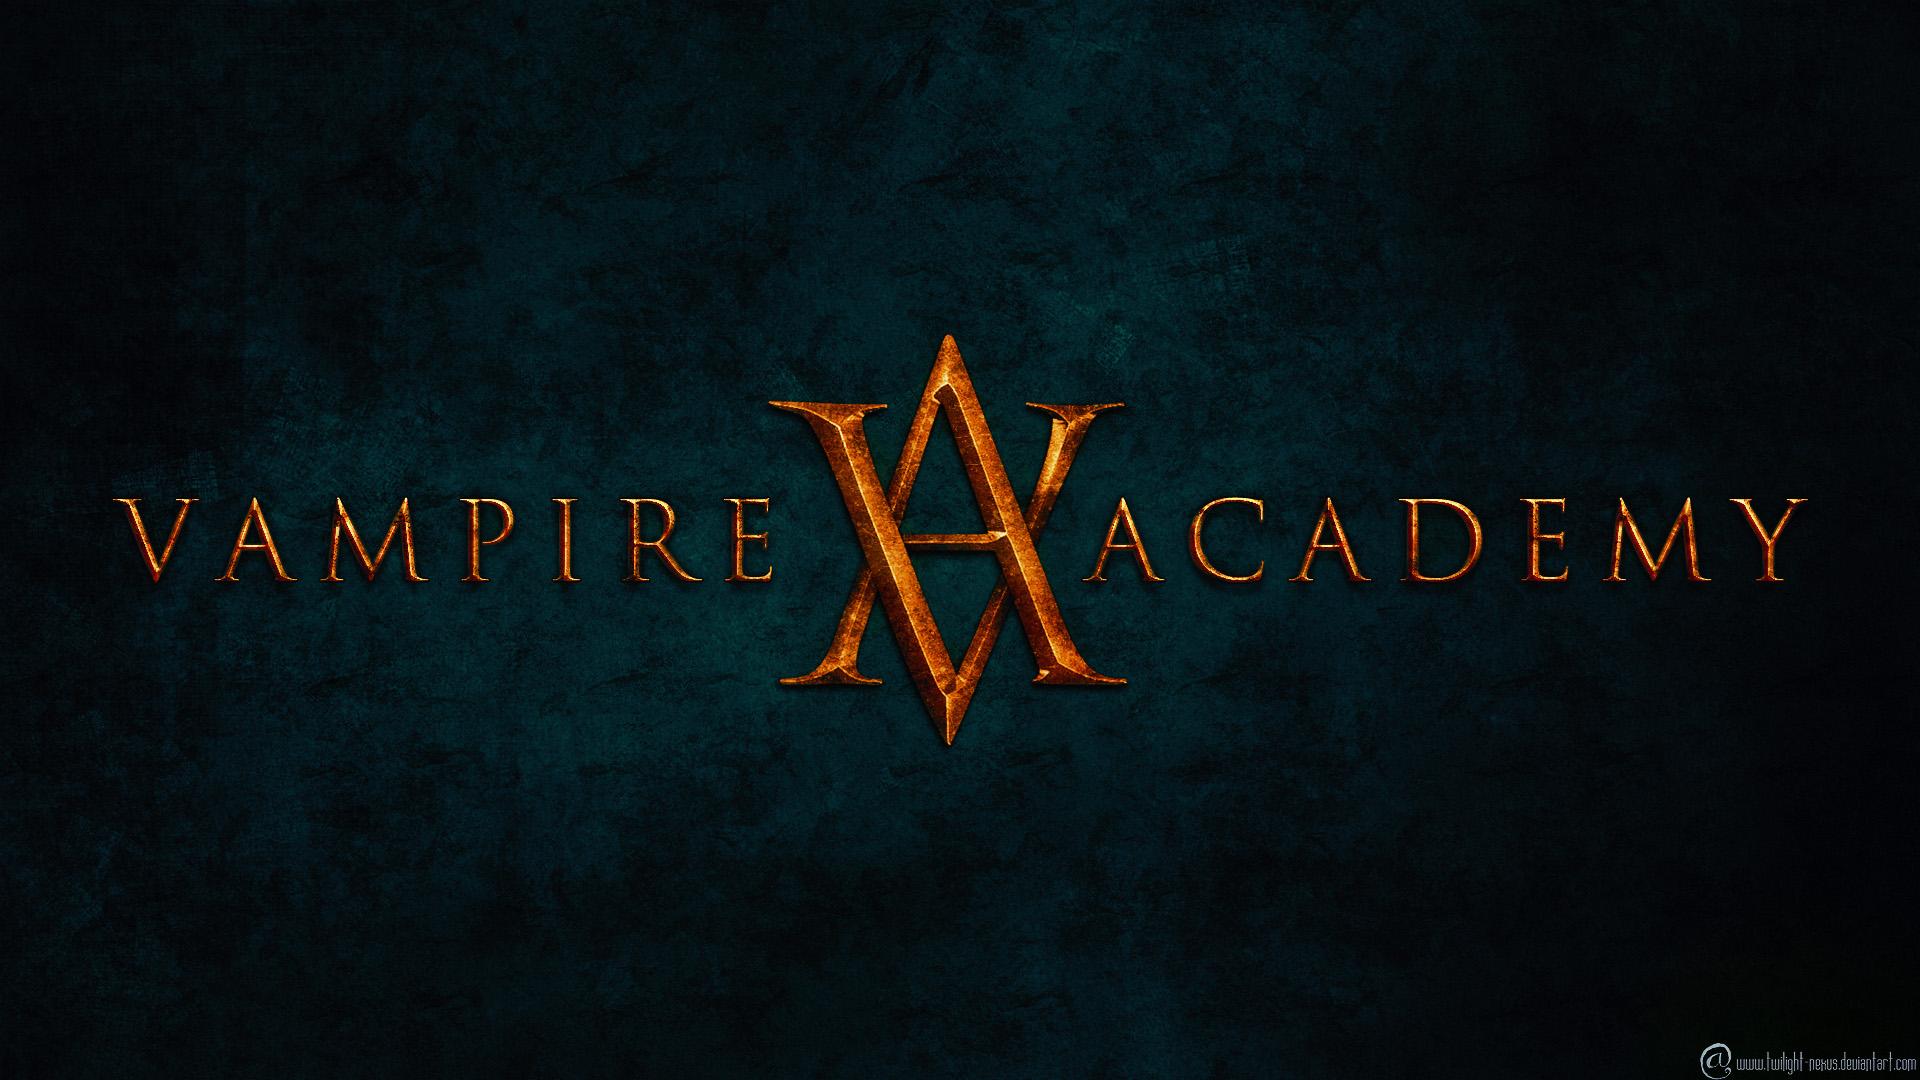 vampire academy by twi...